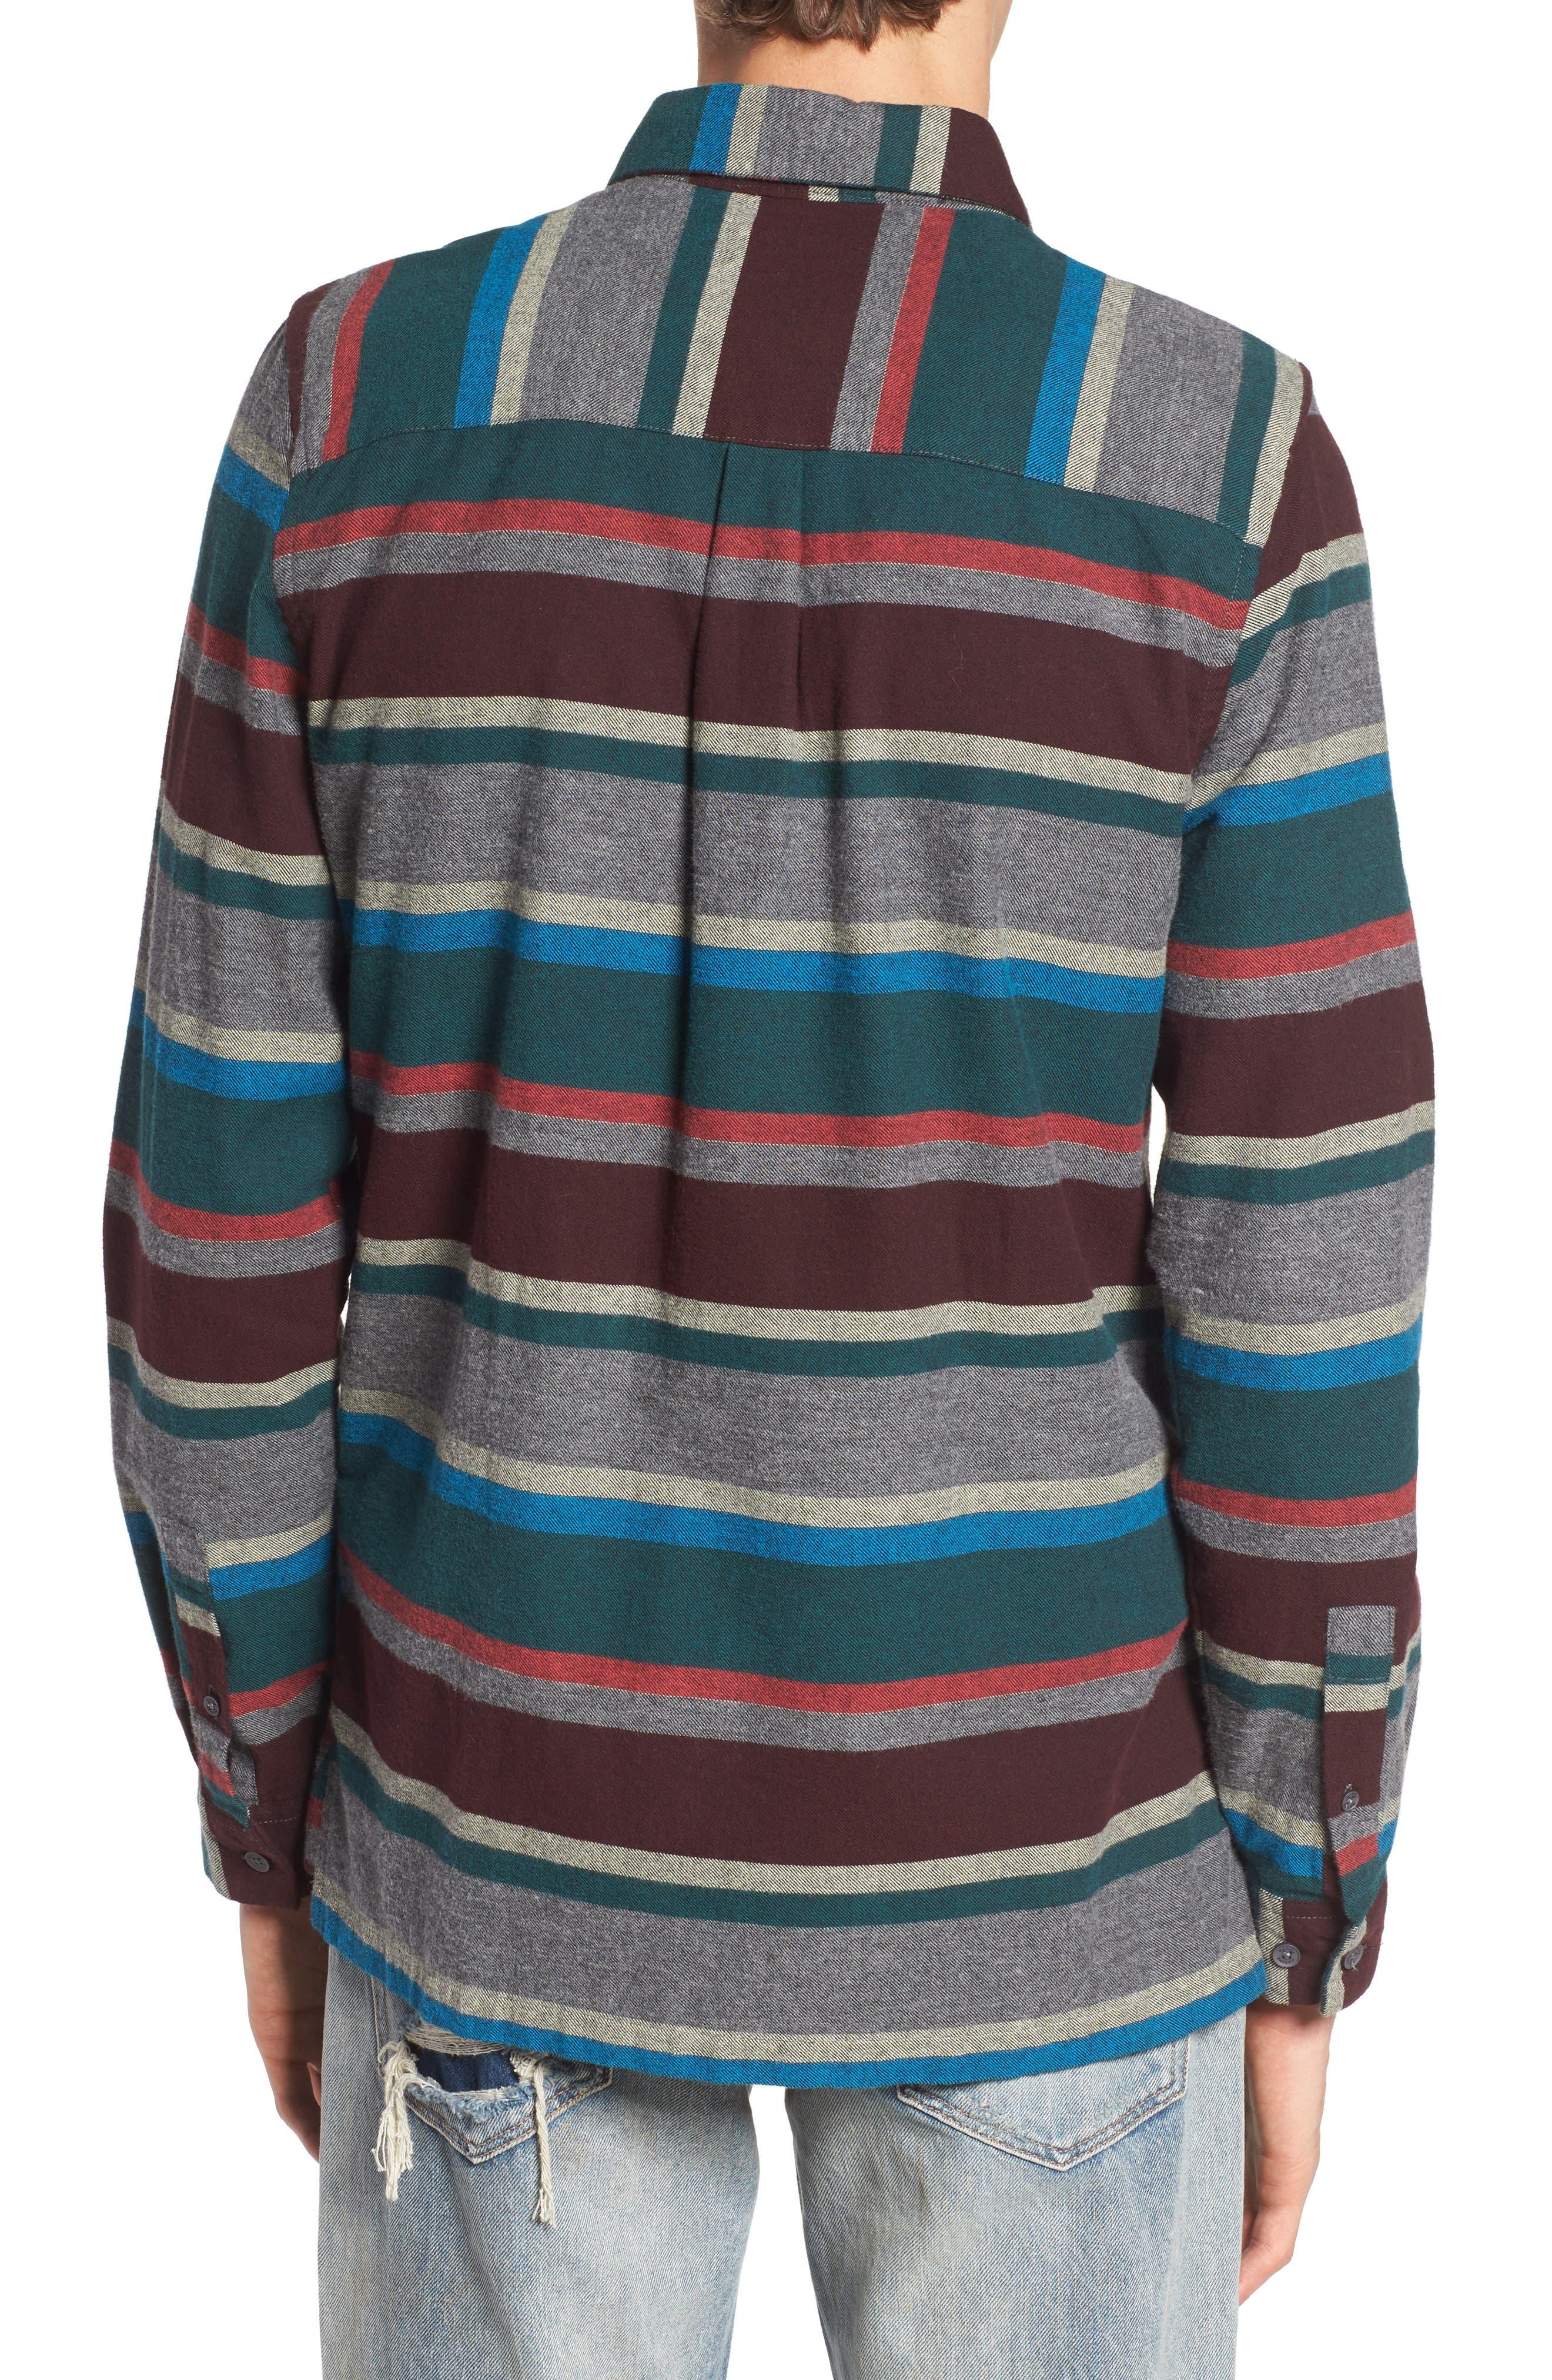 Arcot Woven Shirt,                             Alternate thumbnail 2, color,                             020